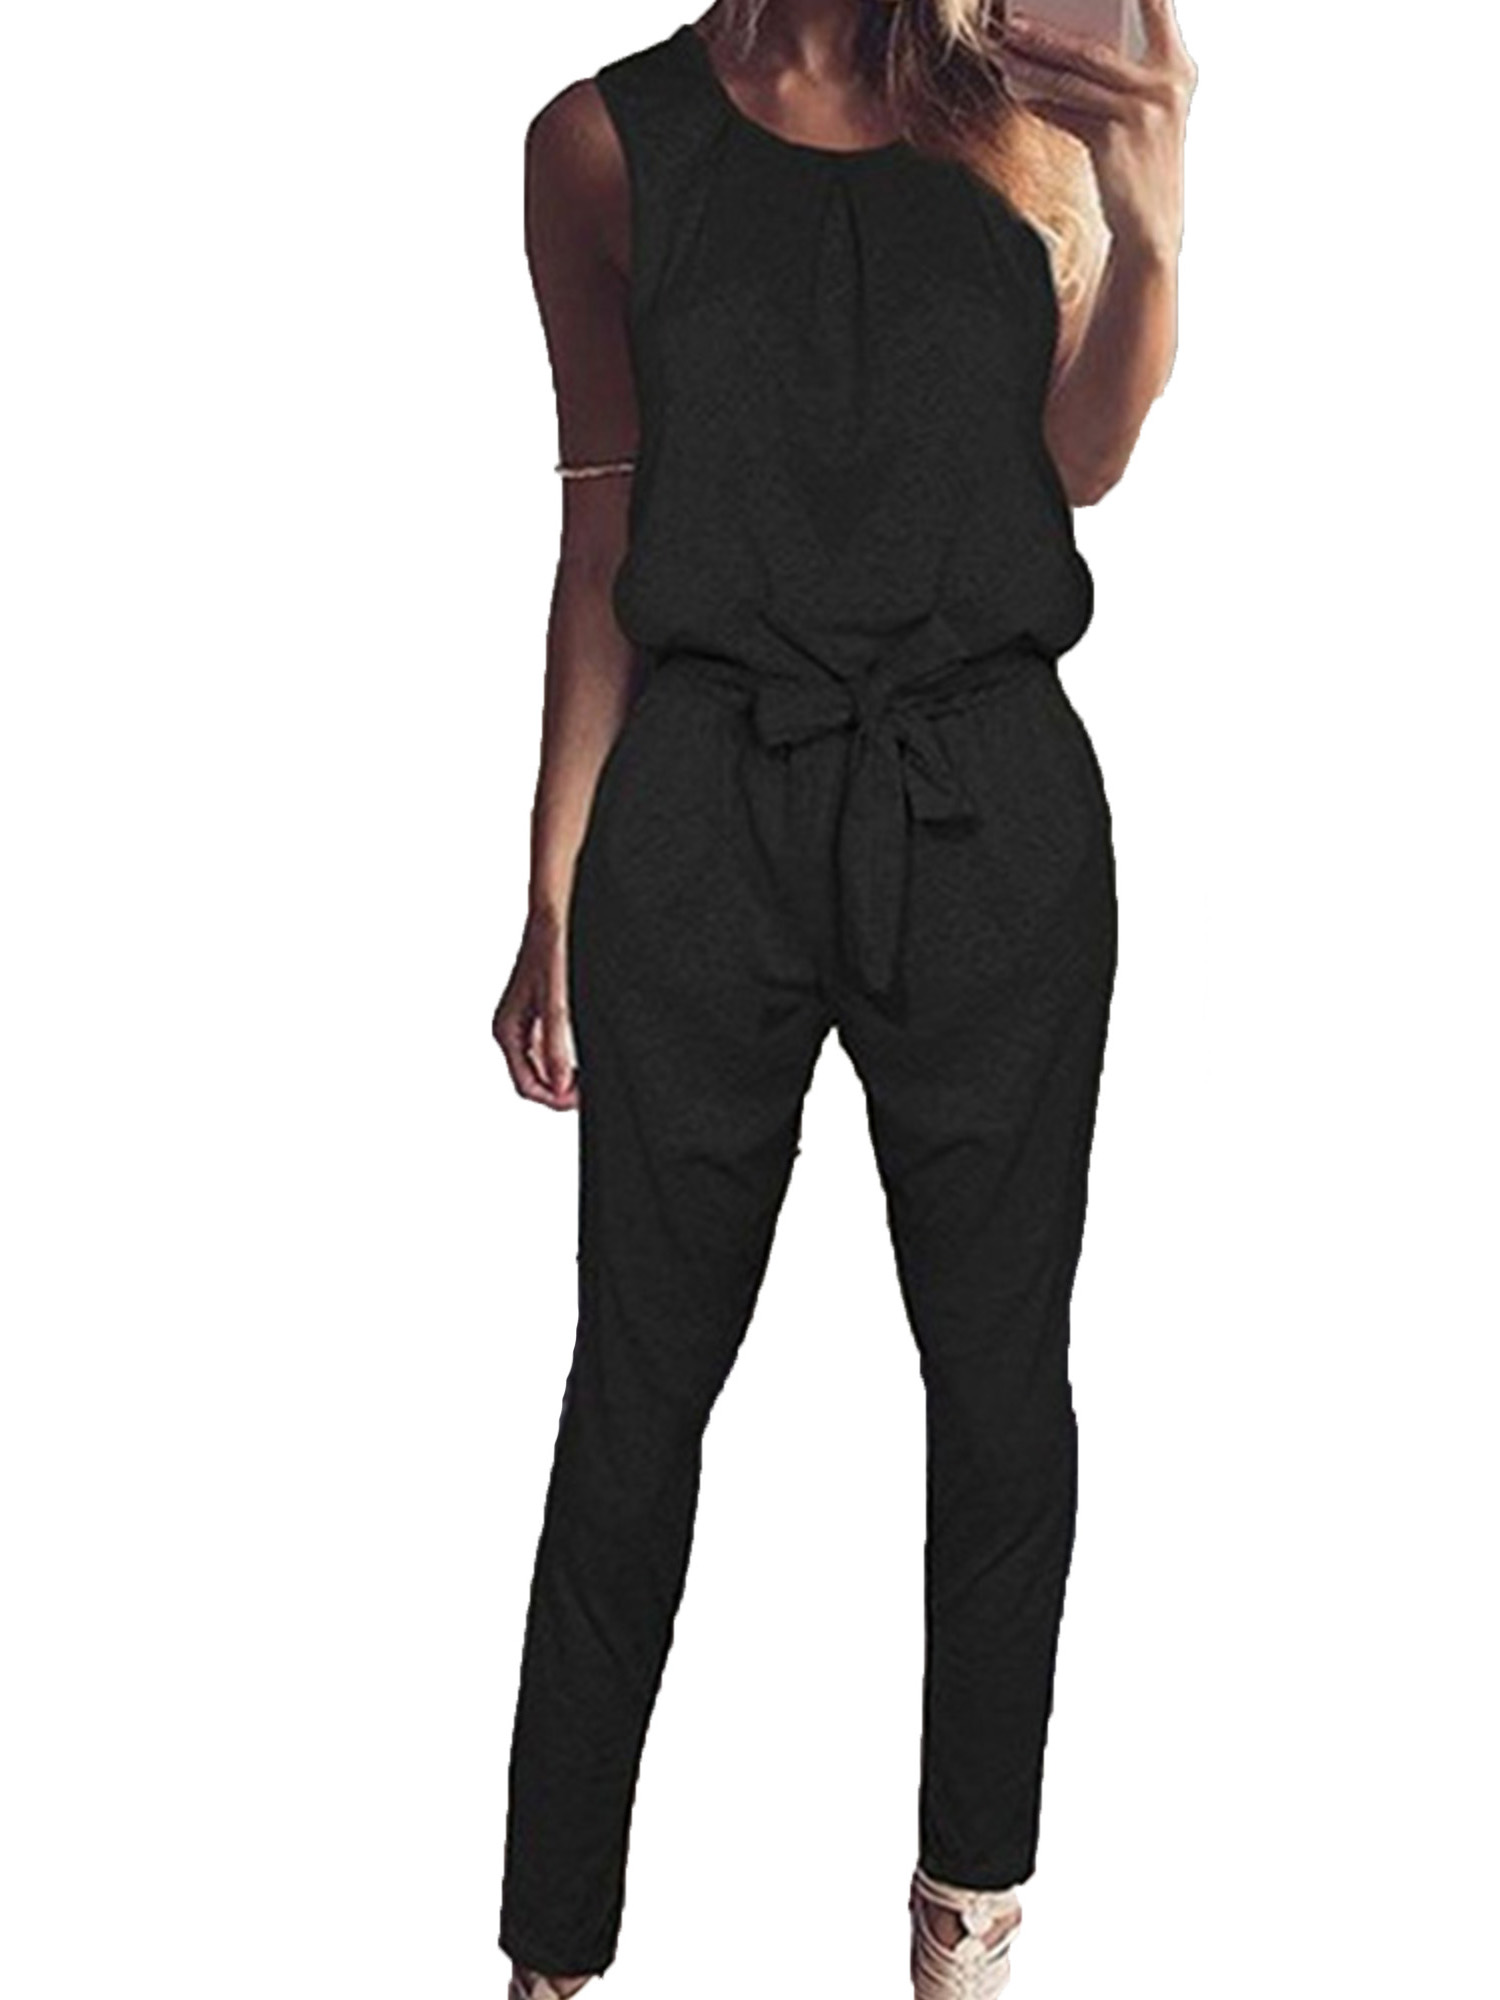 Women Floral Crepe Beach Cover Up Playsuit Jumpsuit Romper Trousers Clubwear